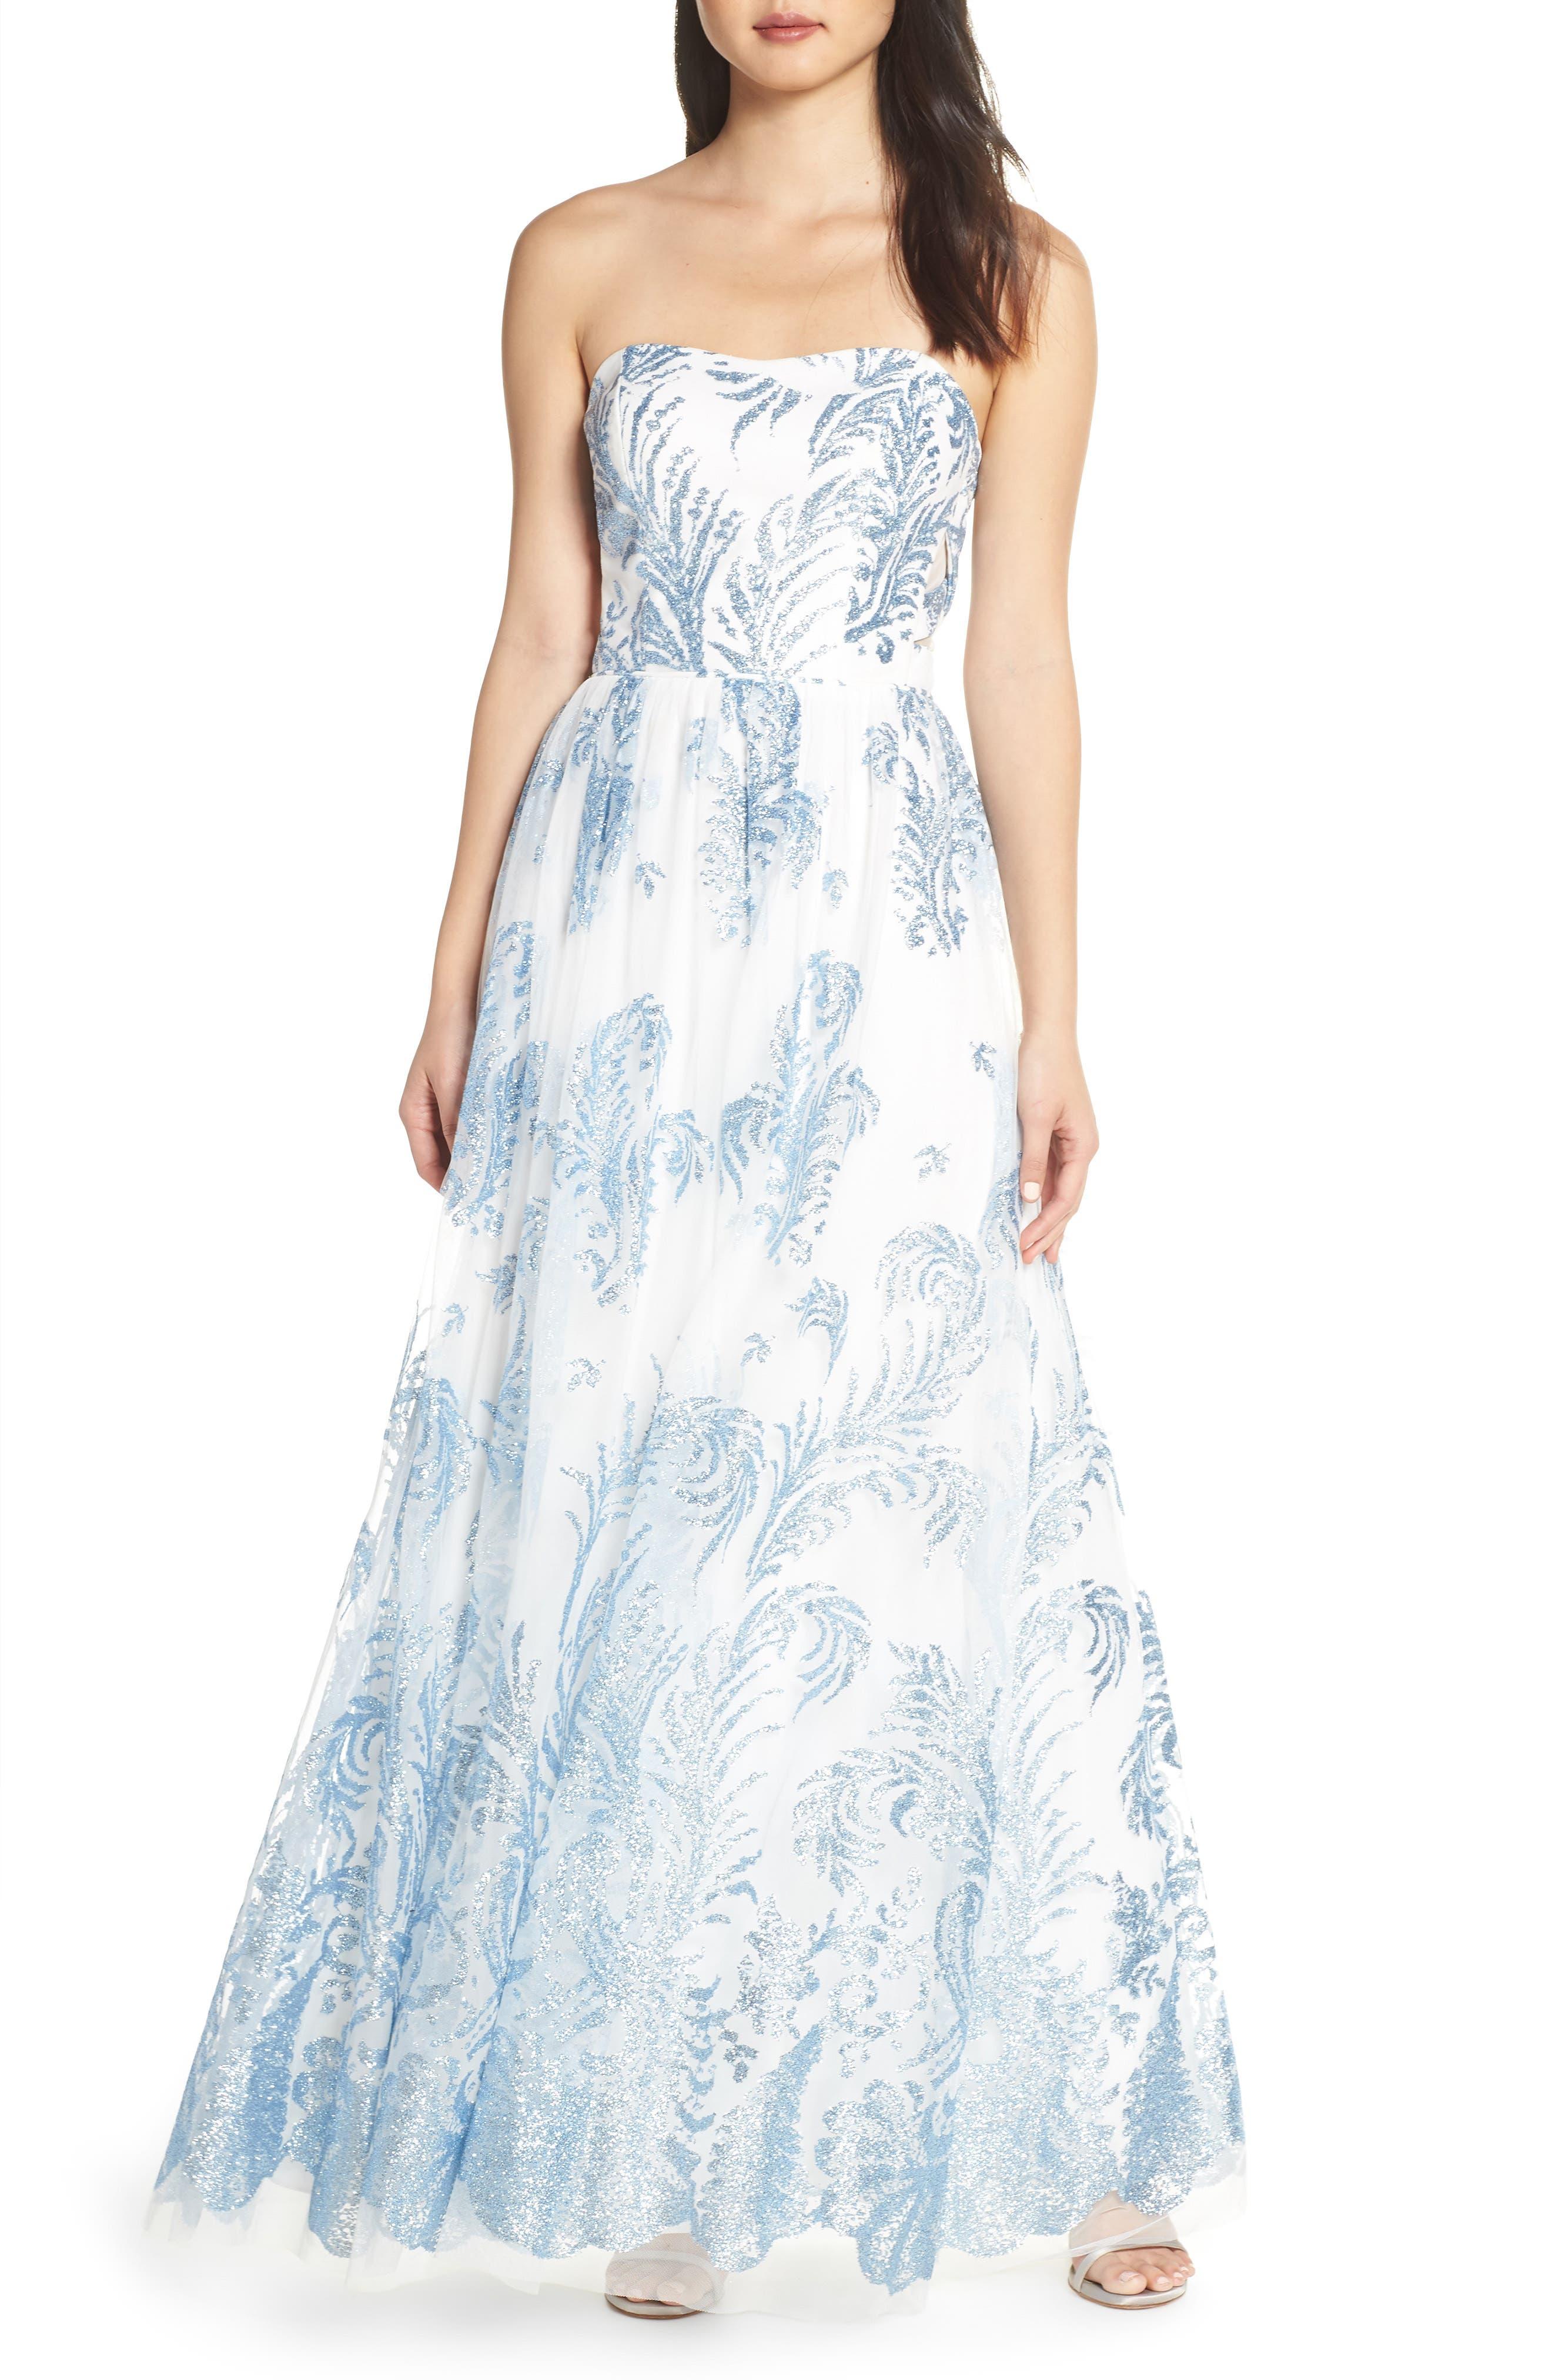 Strapless Glitter Mesh Evening Dress,                             Main thumbnail 1, color,                             IVORY/ BLUE